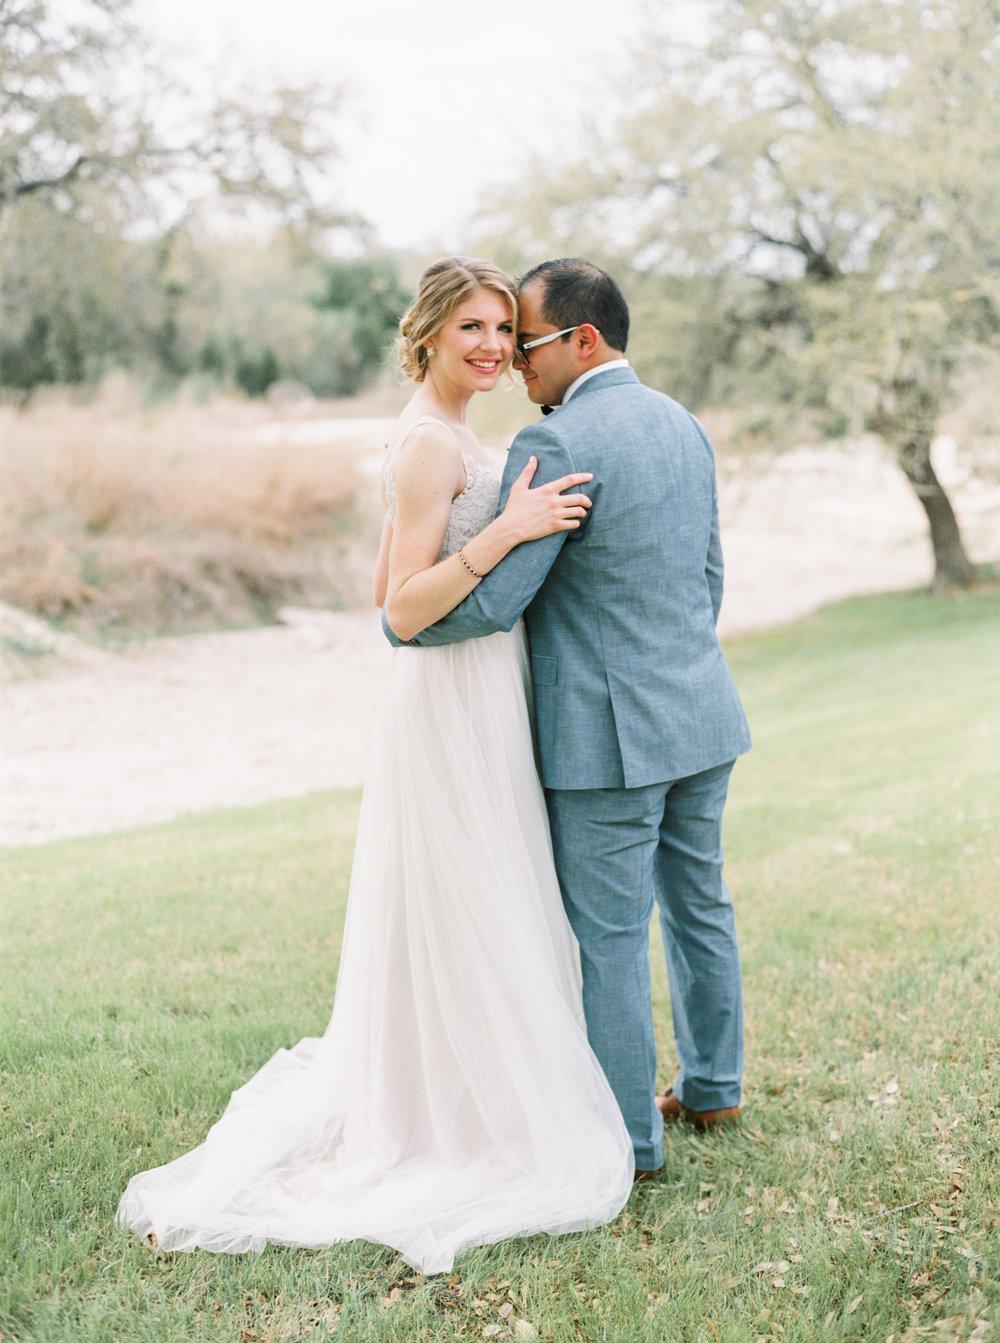 The-Creek-Haus-Wedding-Dripping-Springs-83.jpg